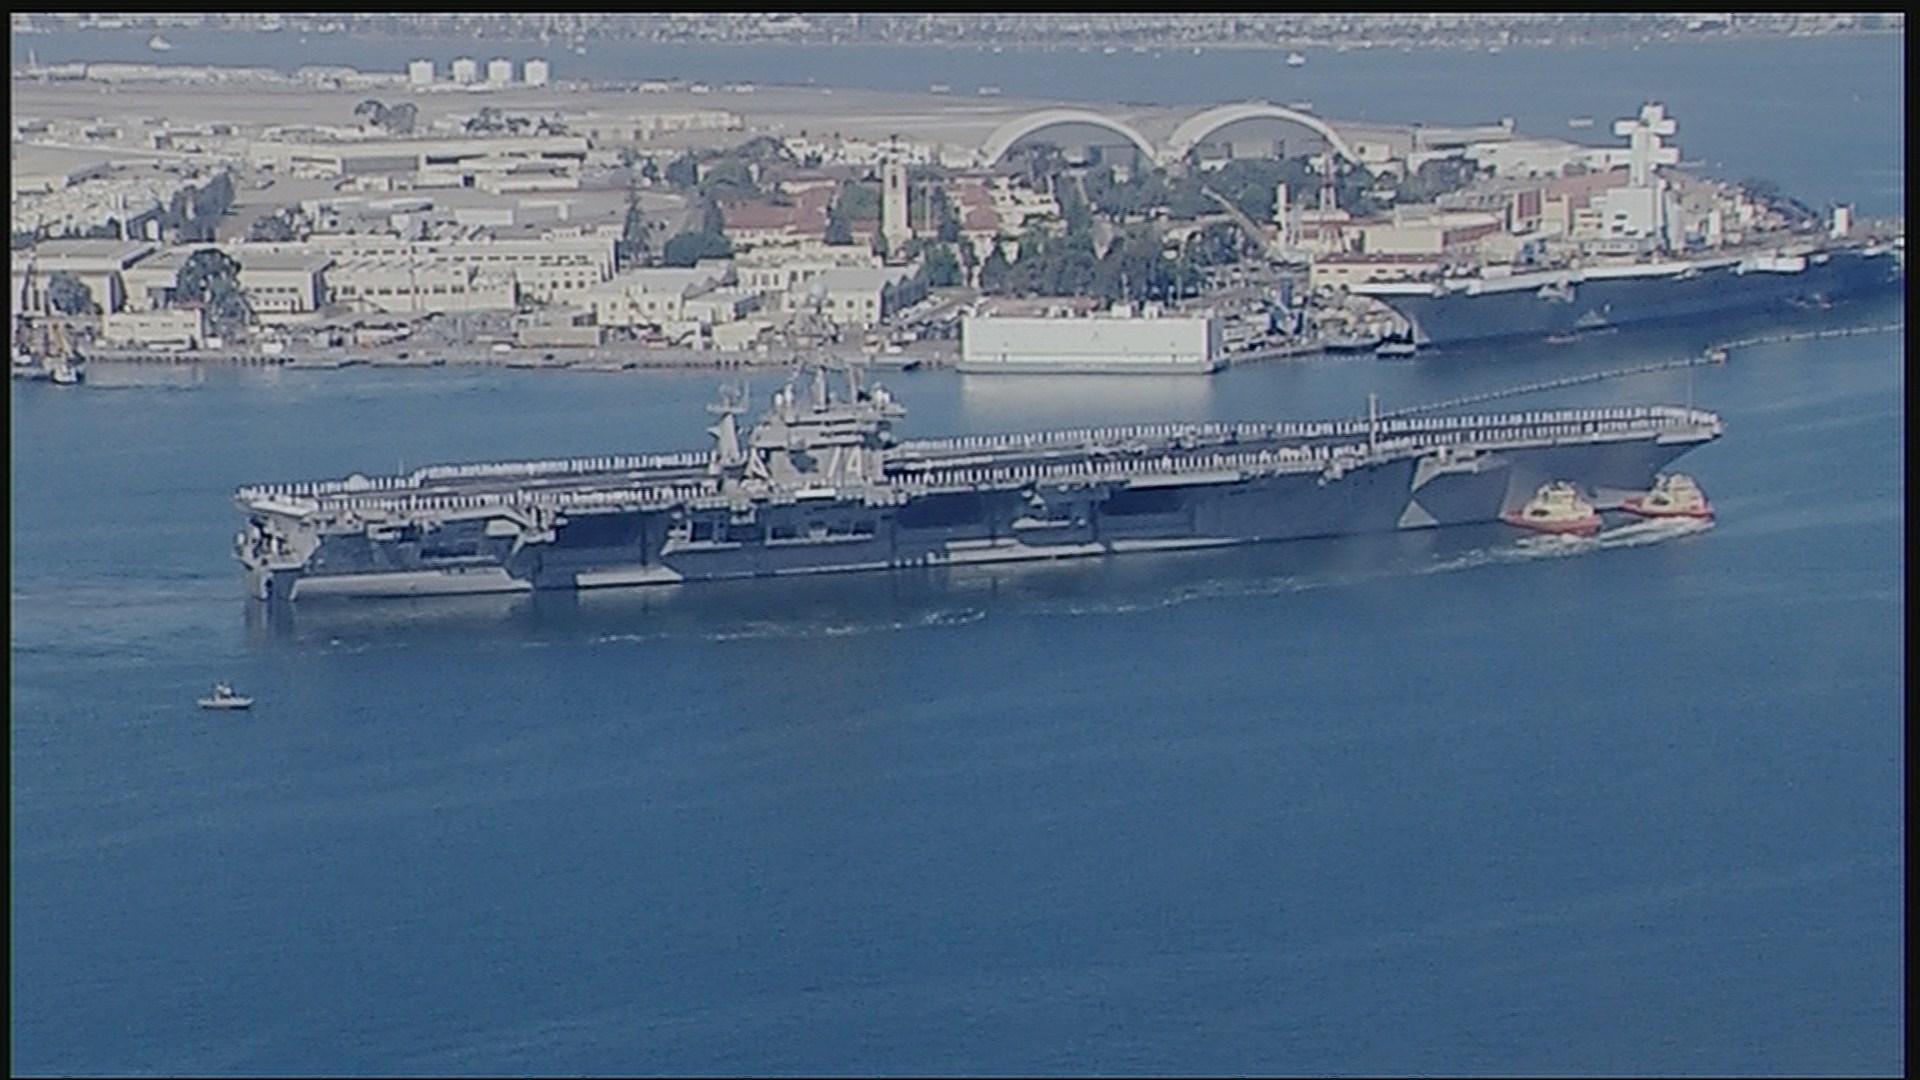 Uss Mobile Bay Deploys To Persian Gulf Cbs News 8 San